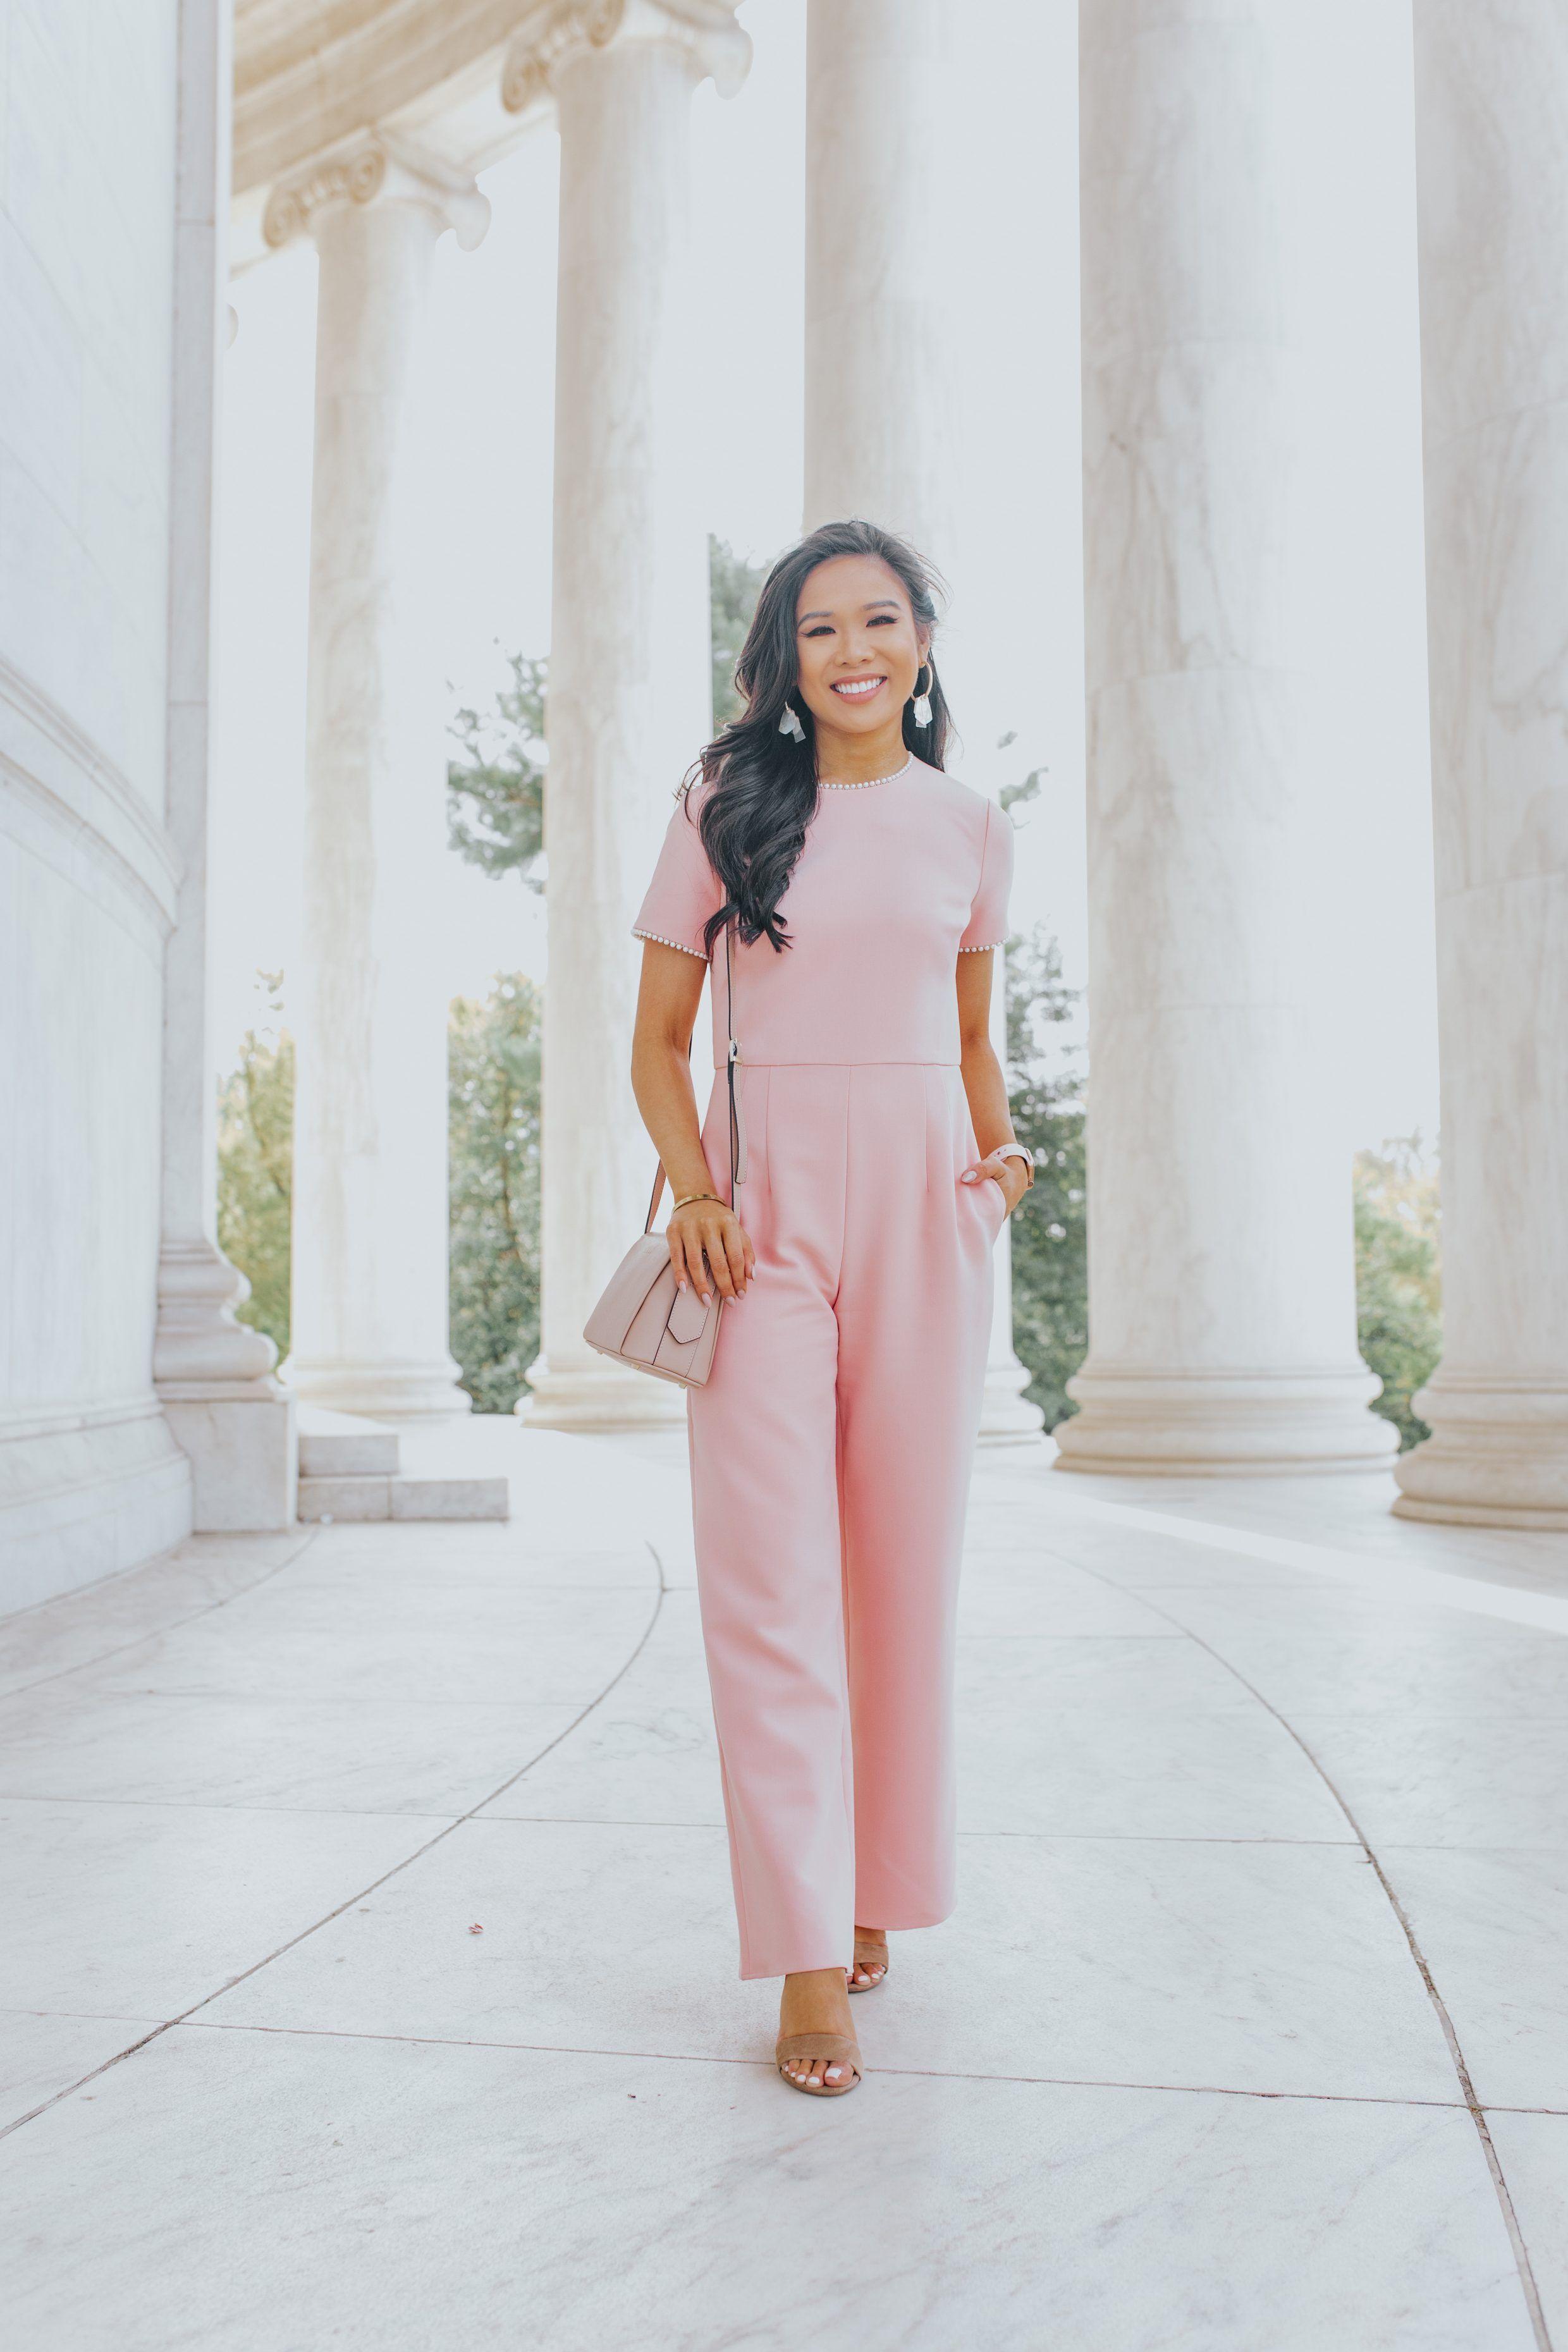 5931516fc Blogger Hoang-Kim wears a pink pearl trim dressy jumpsuit   jumpsuit summer  jumpsuit casual jumpsuit elegant jumpsuit prom jumpsuit outfit jumpsuit  formal ...